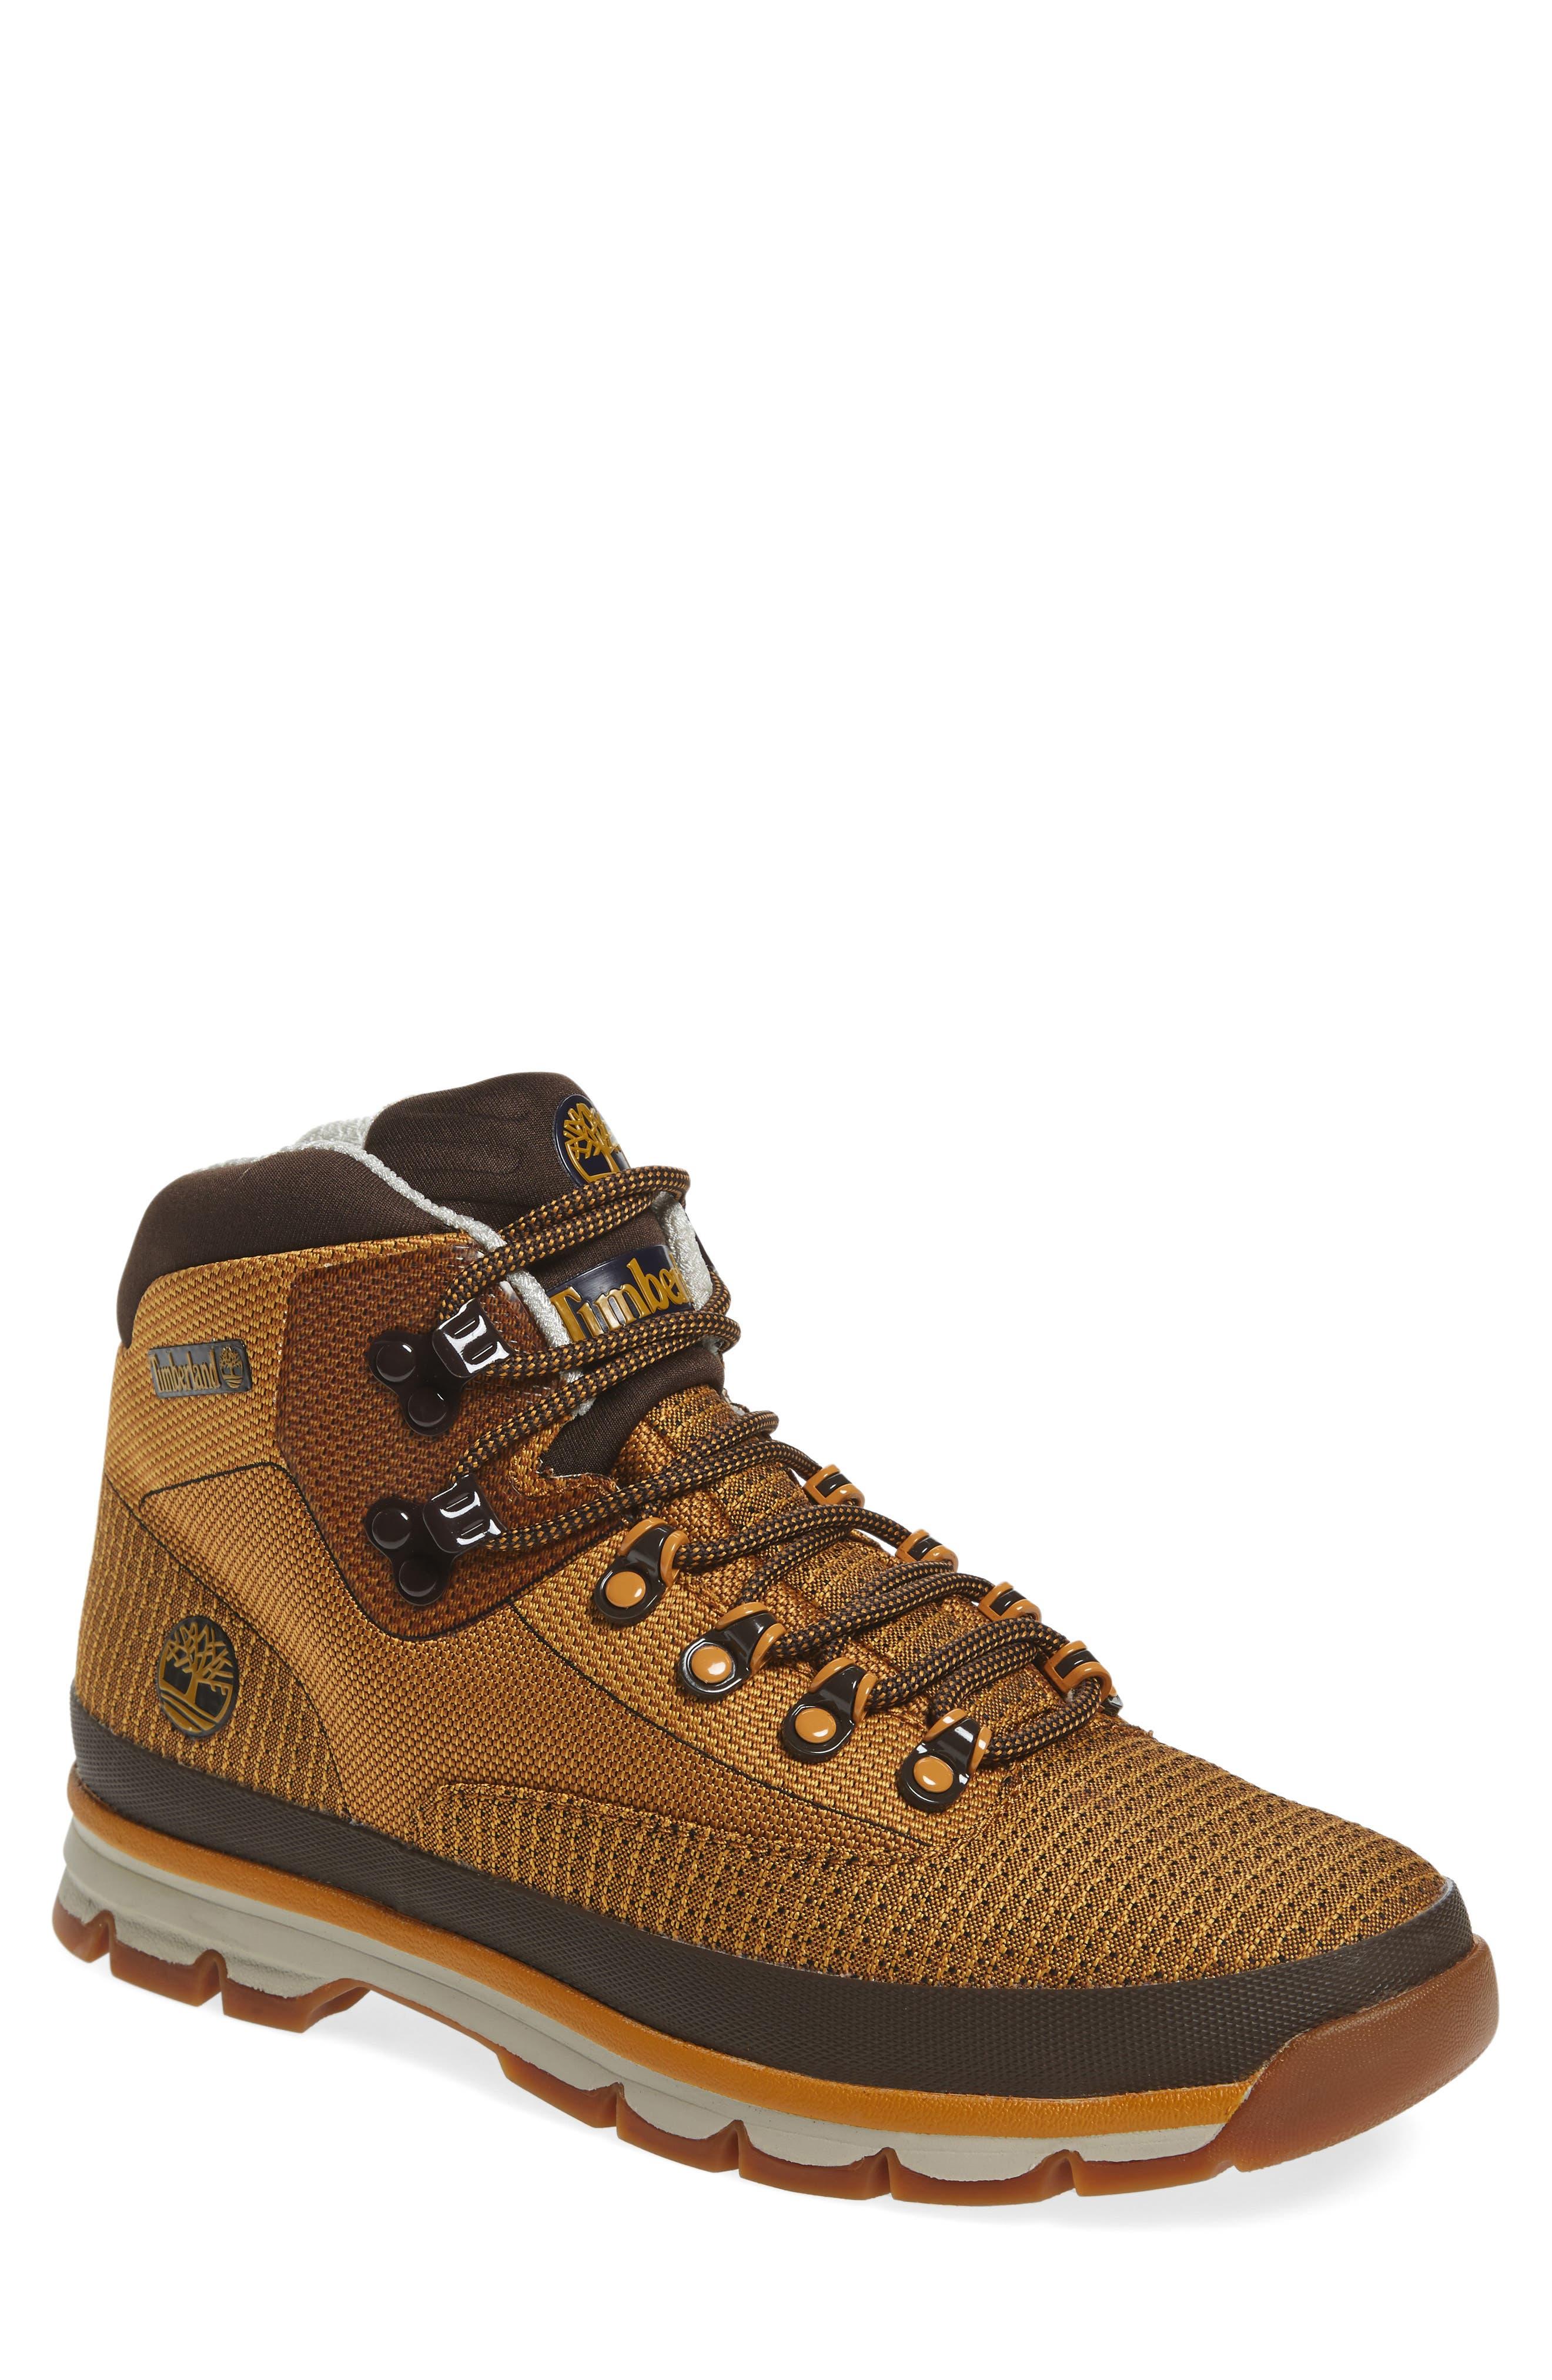 Euro Hiker Boot,                         Main,                         color, 210